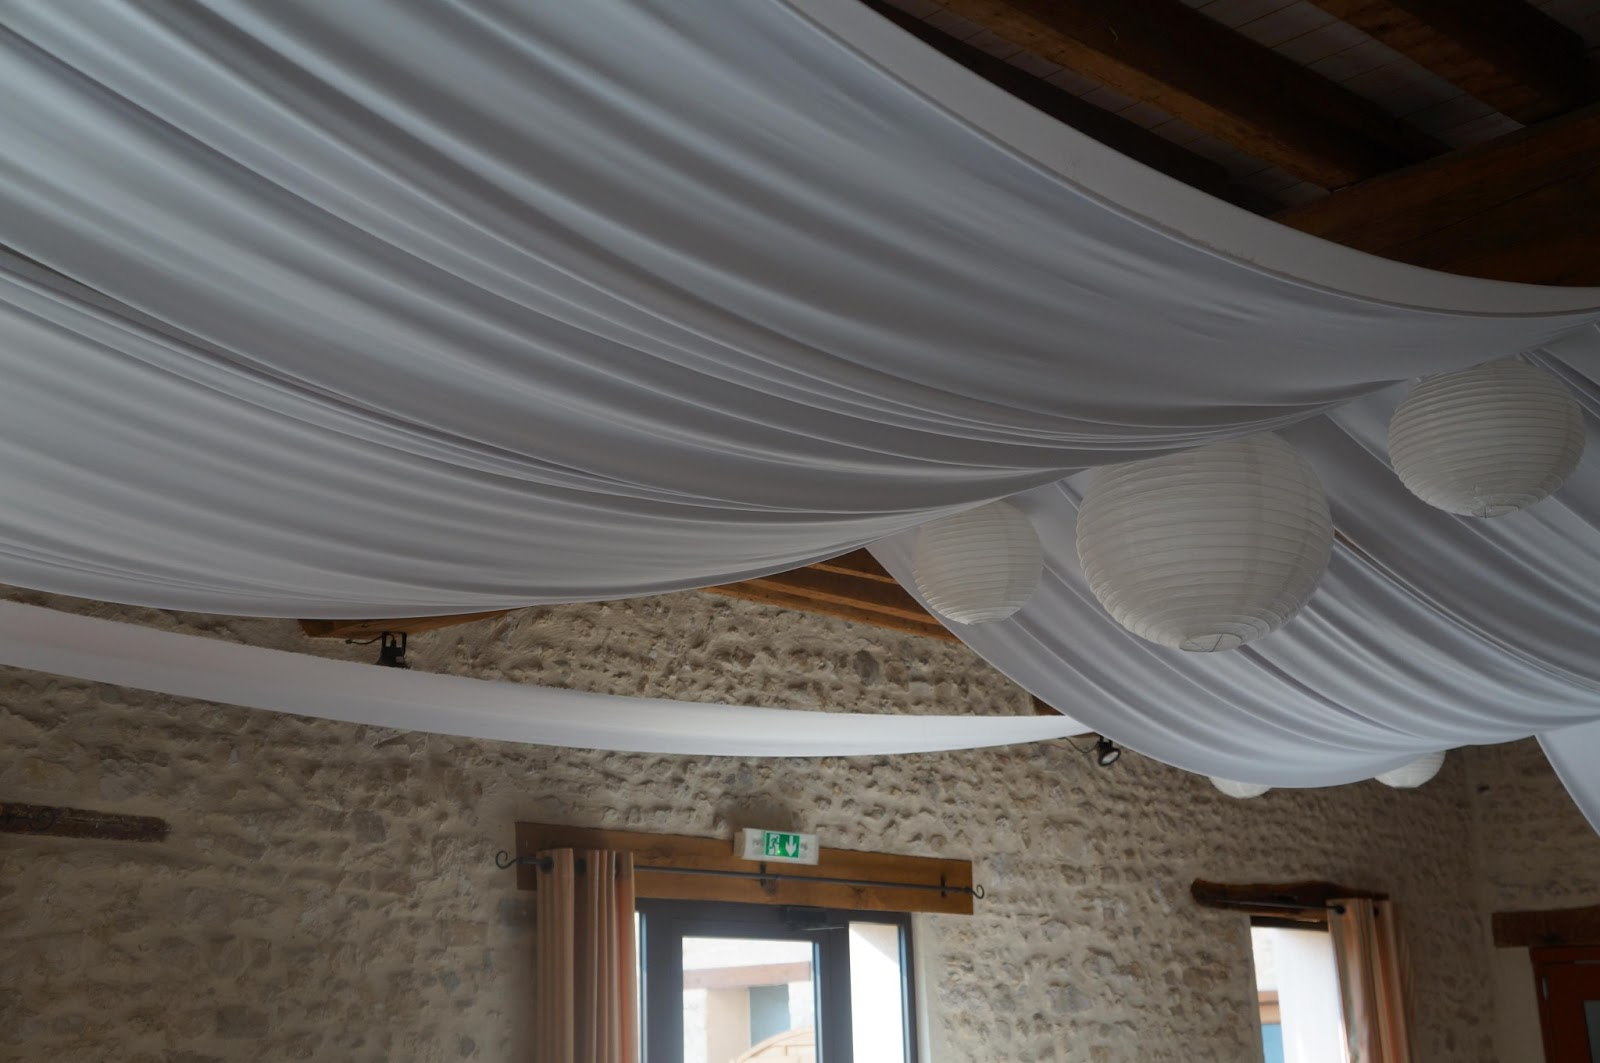 decoration anniversaire d coration salle anniversaire f te anniversaire anniversaire d co. Black Bedroom Furniture Sets. Home Design Ideas